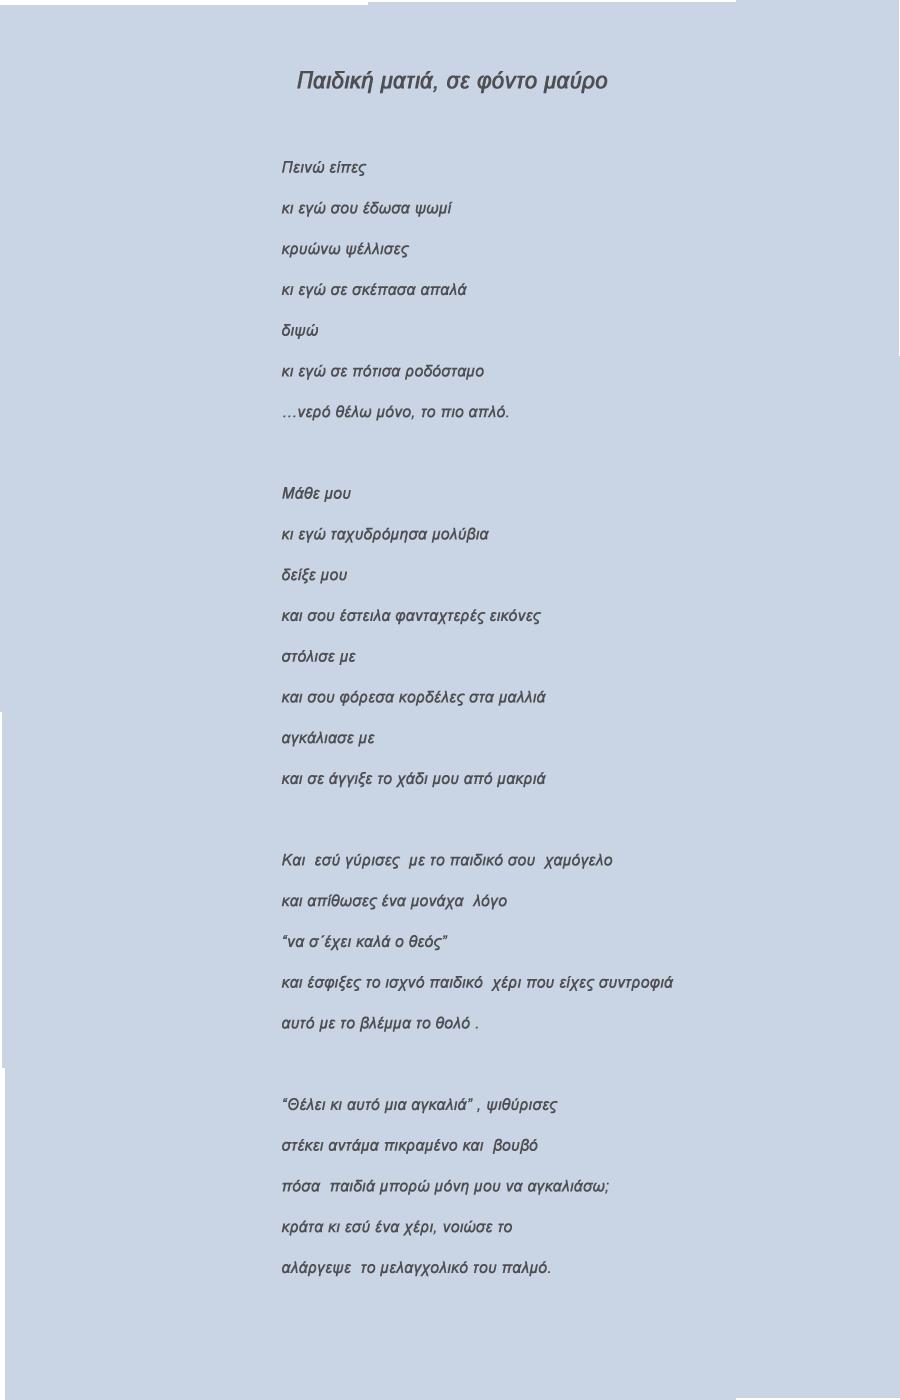 poem_8_Παιδική ματιά σε φόντο μαύρο